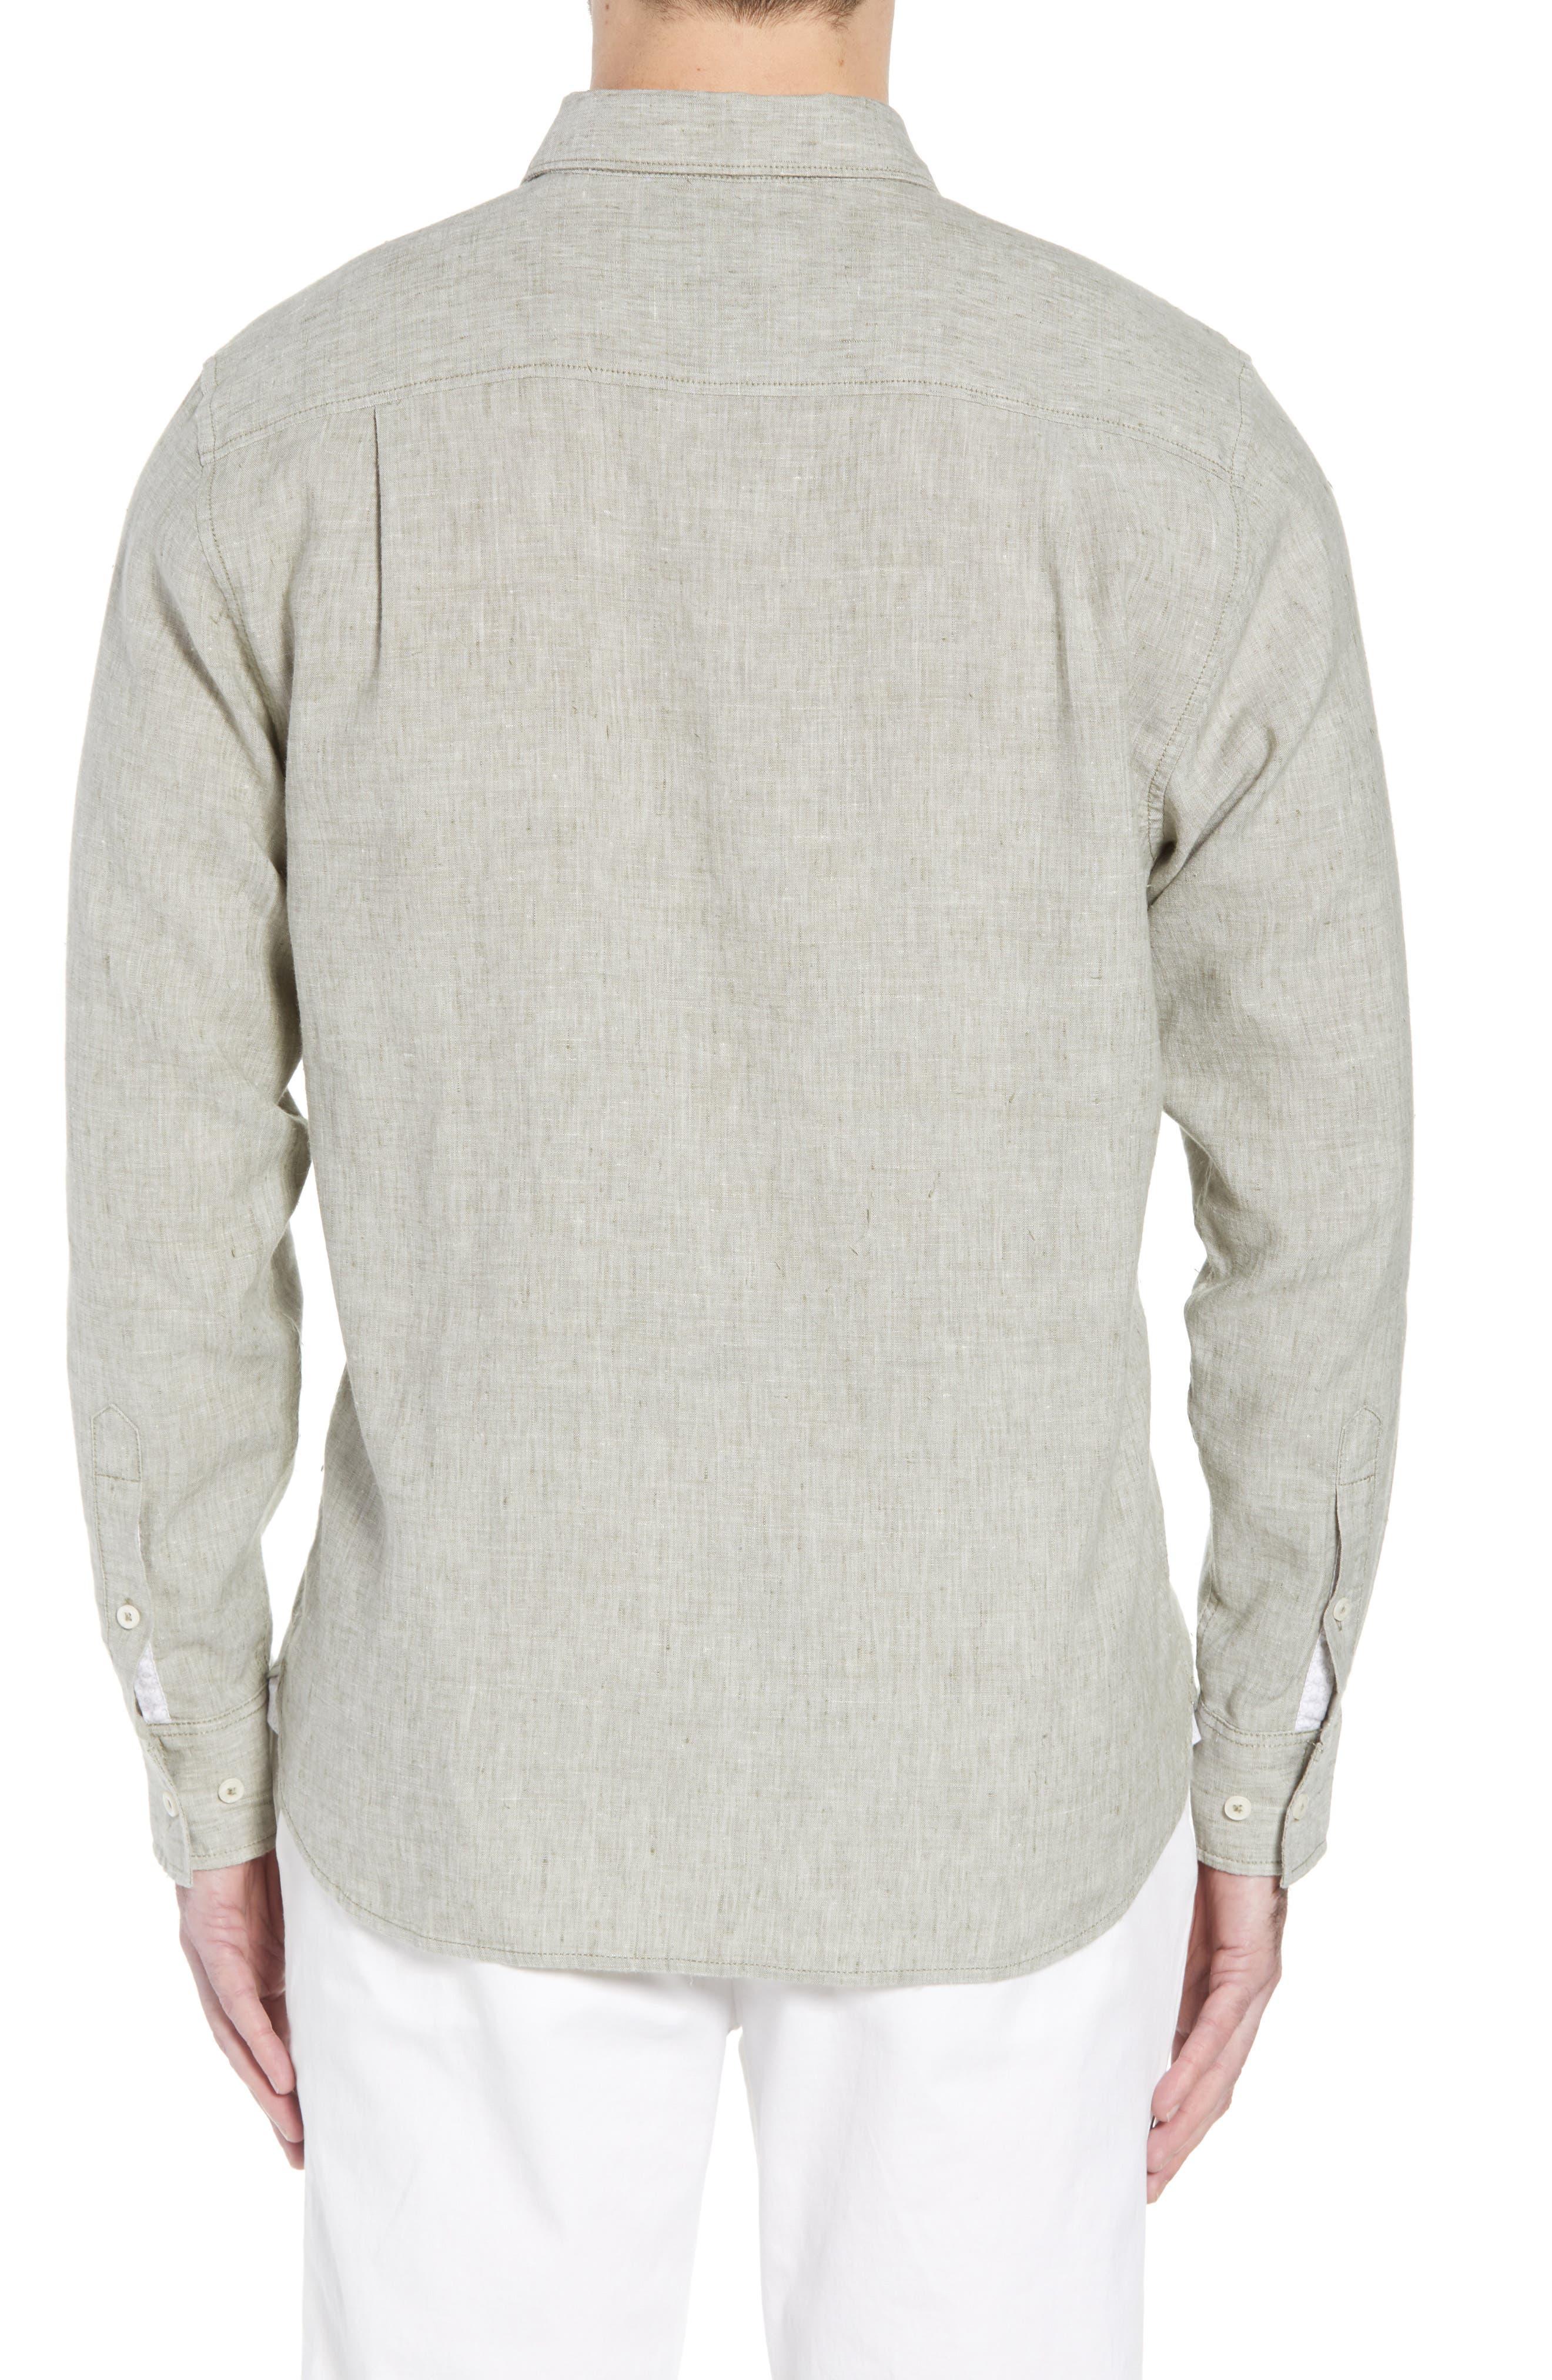 Alternate Image 2  - Tommy Bahama Lanai Tides Regular Fit Linen Blend Sport Shirt